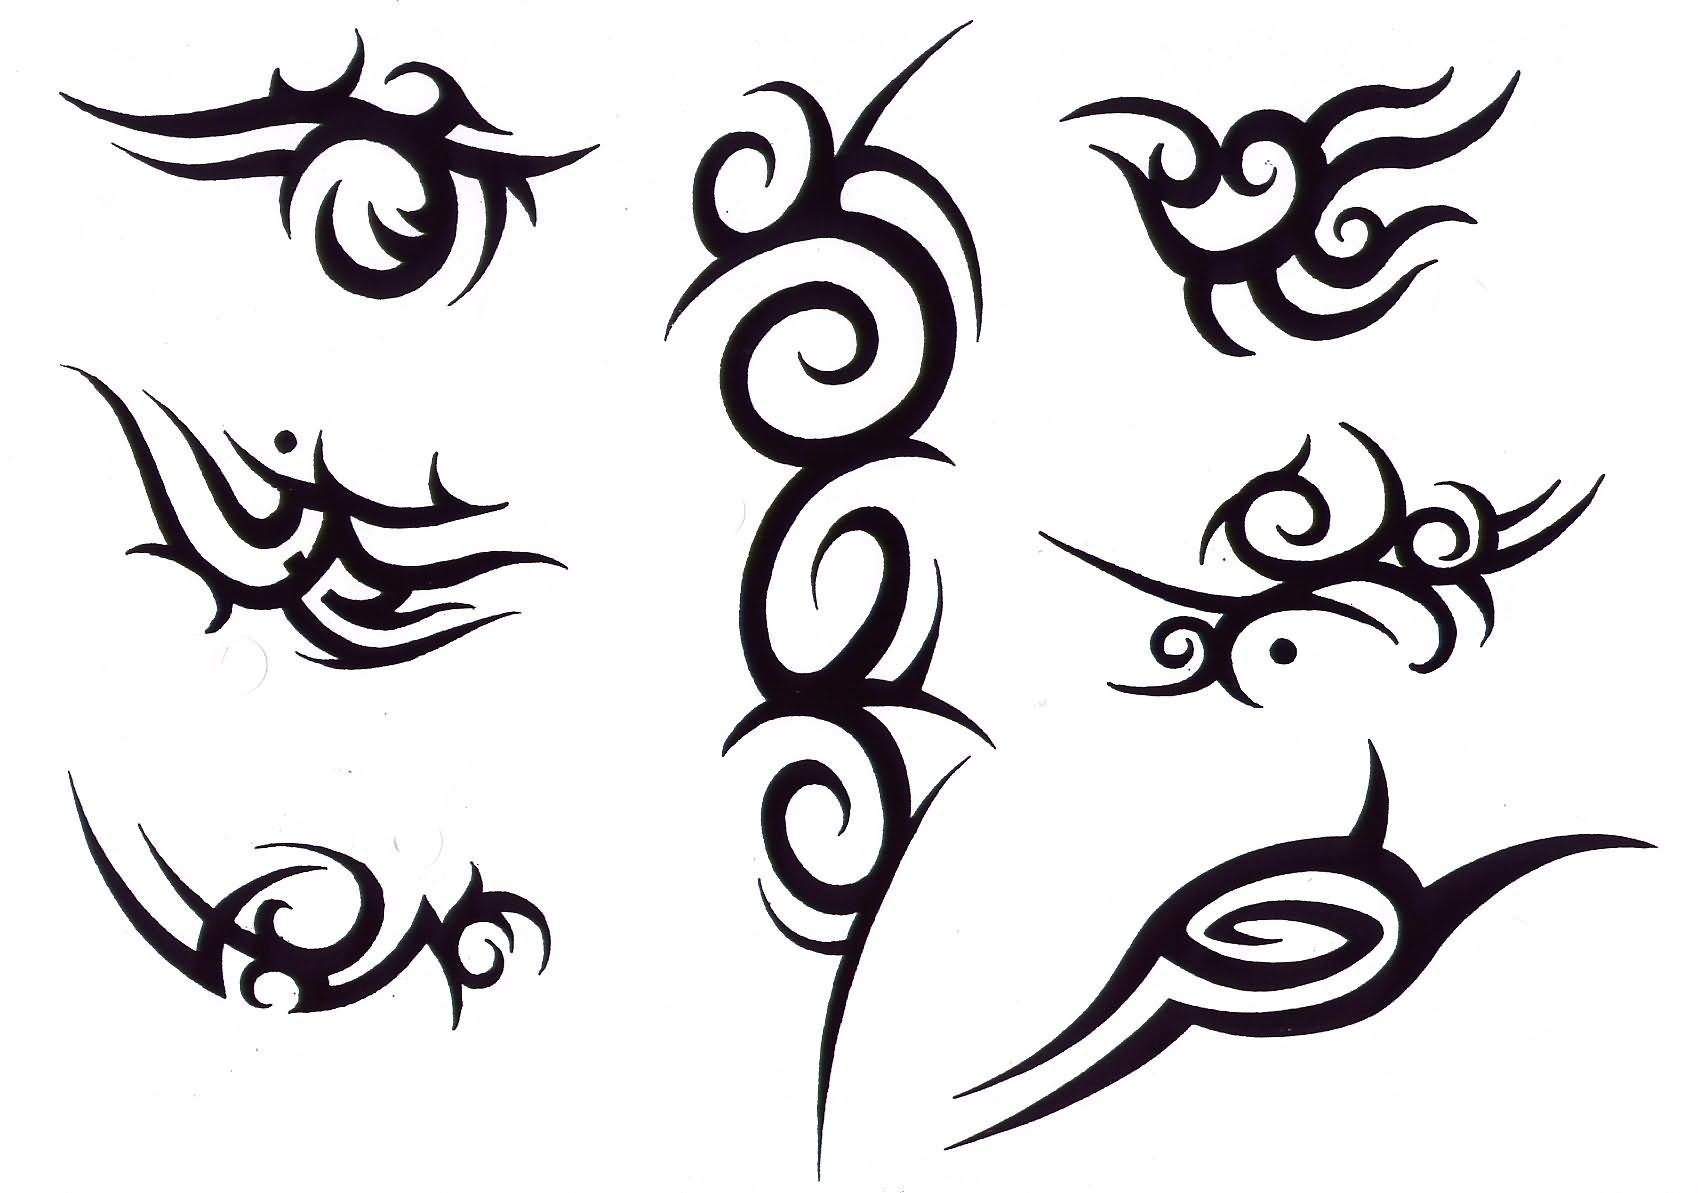 Tribal-Tattoos Superb-Black-Tribal-Tattoos-Designs